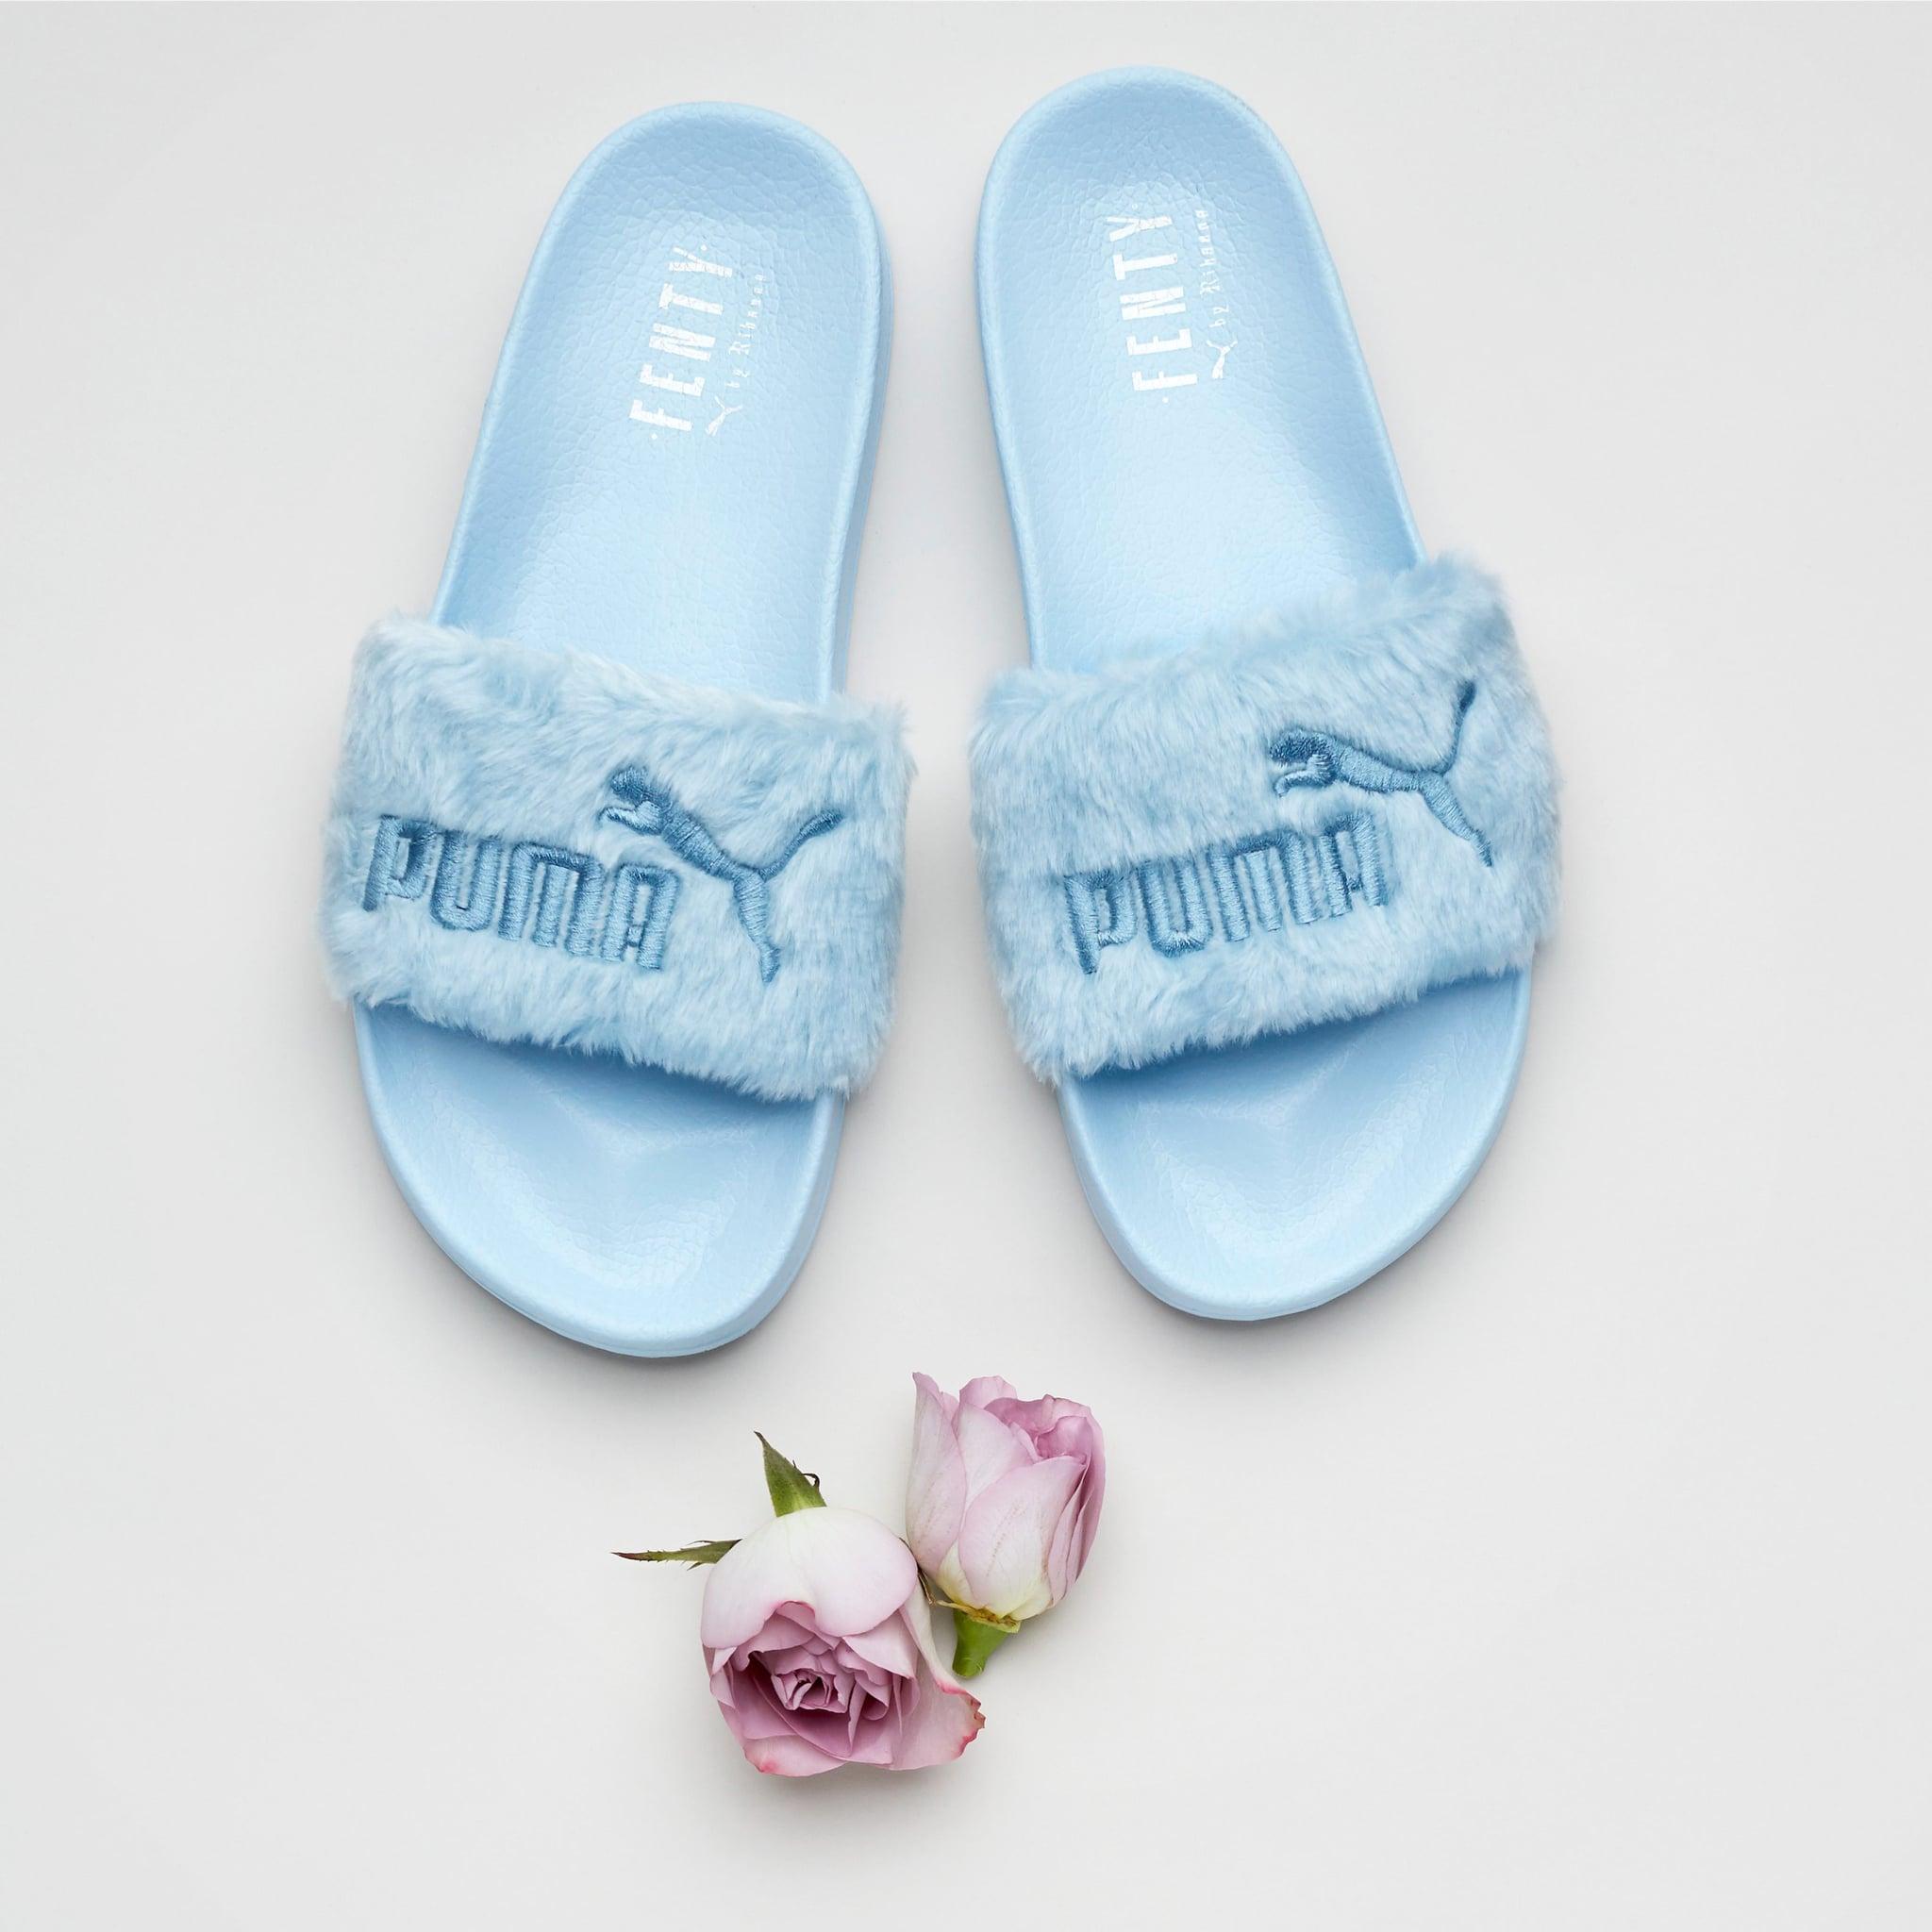 baby puma sandals